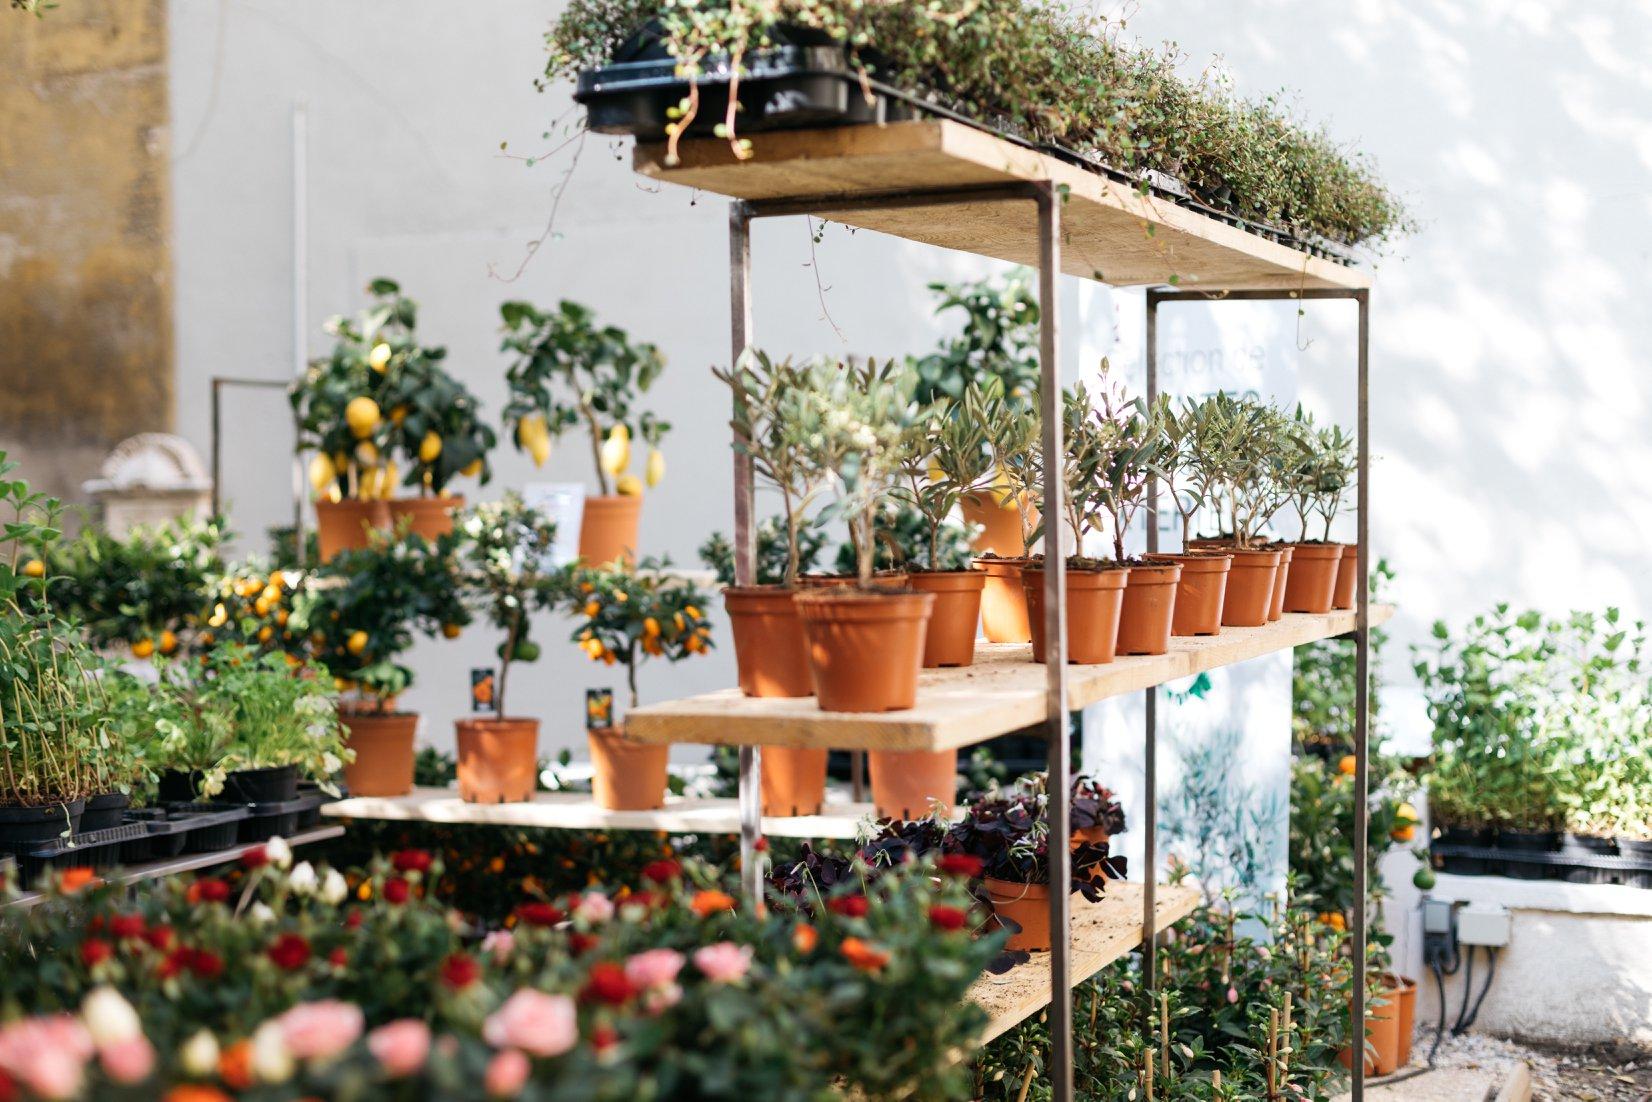 Maison Bouture presenta un jardín efímero en Donostia